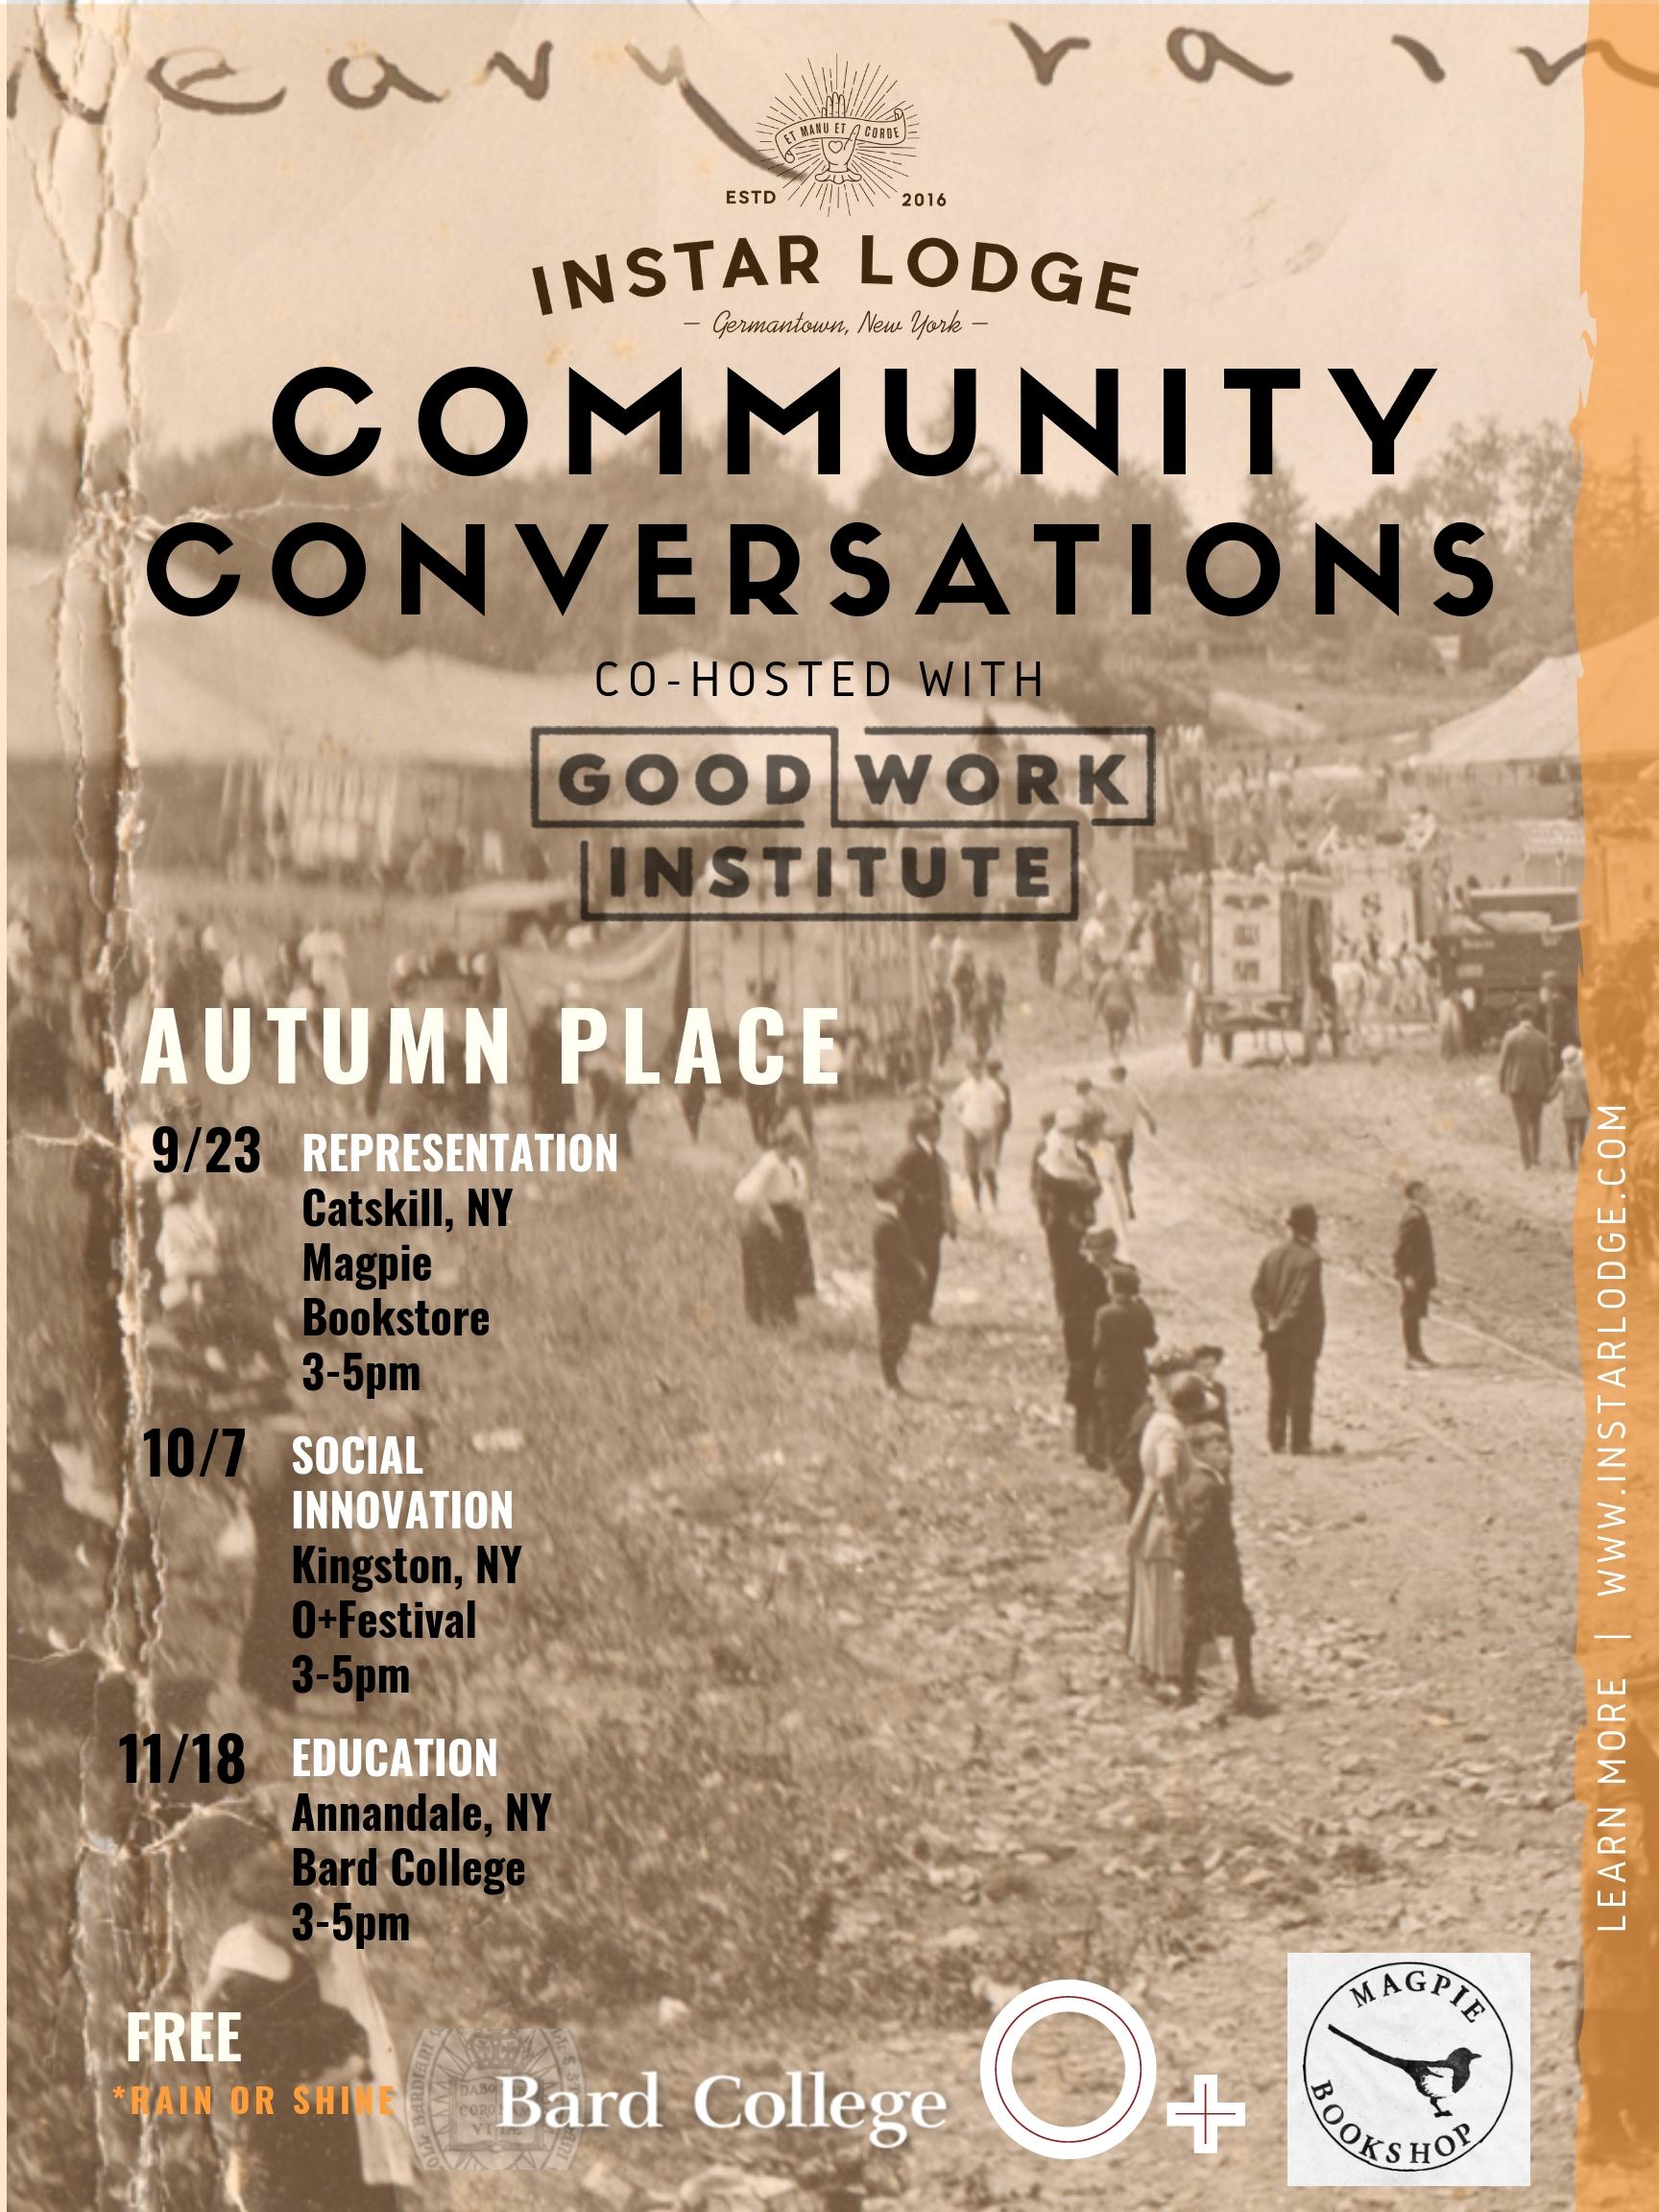 FINAL DRAFT Autumn Place Community Conversation Poster(4).jpg